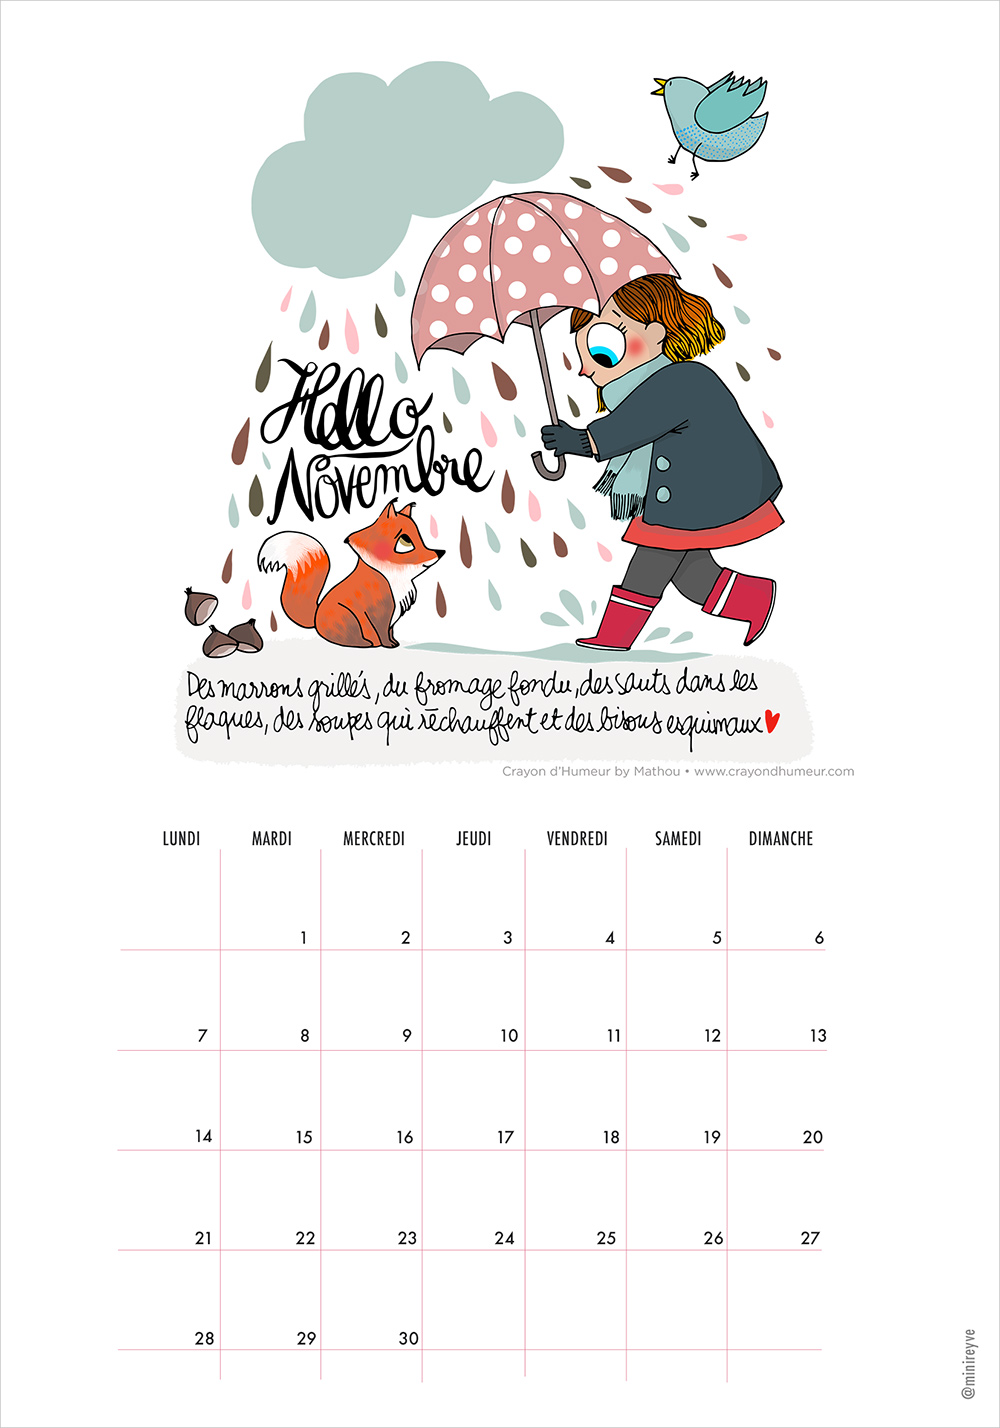 calendrier-printable-novembre-minireyve-mathou